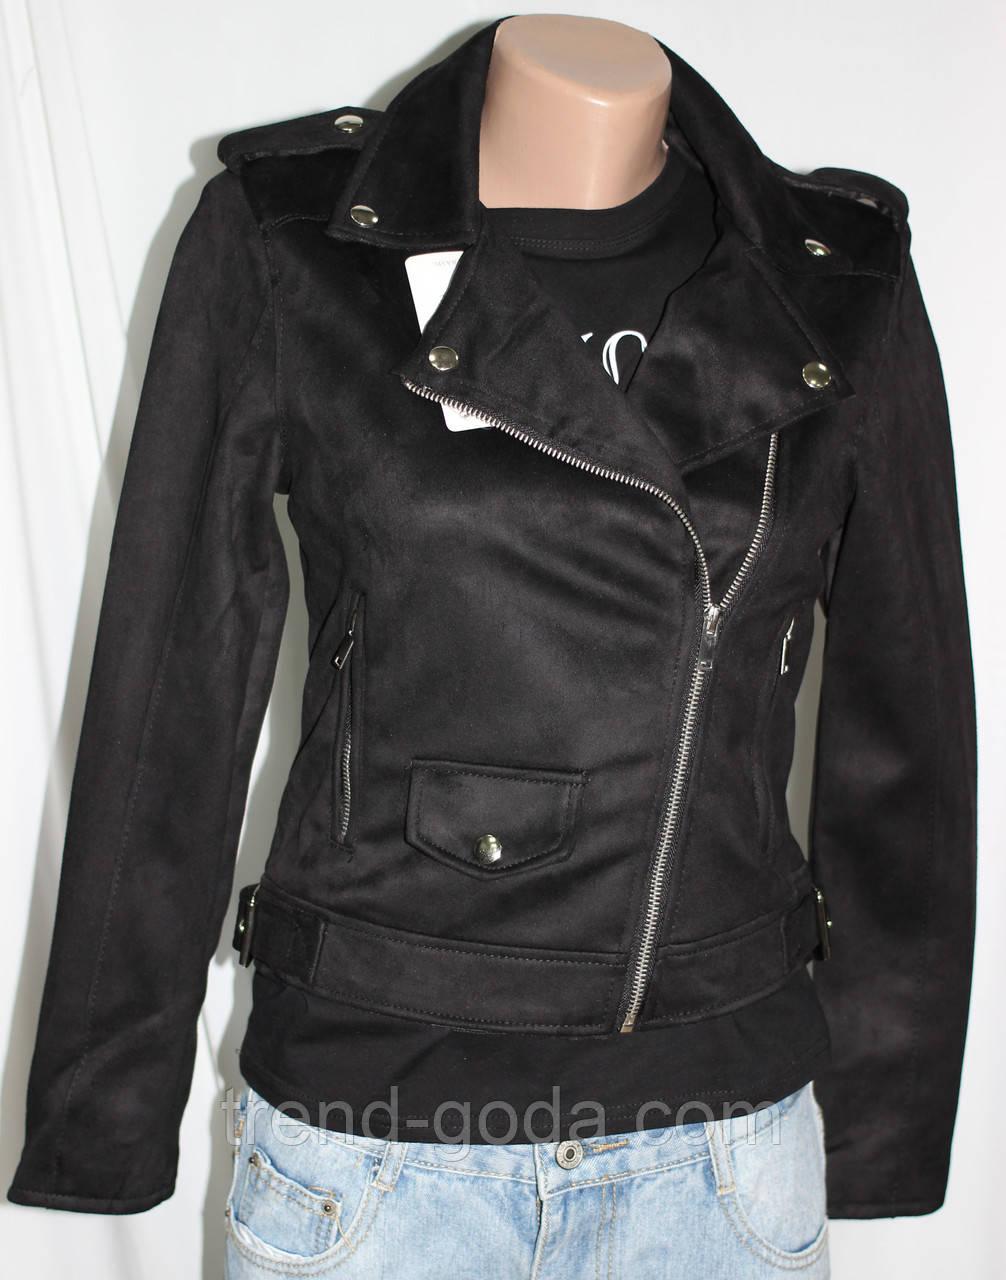 Куртка-косуха  молодежная короткая, черная, под замшу